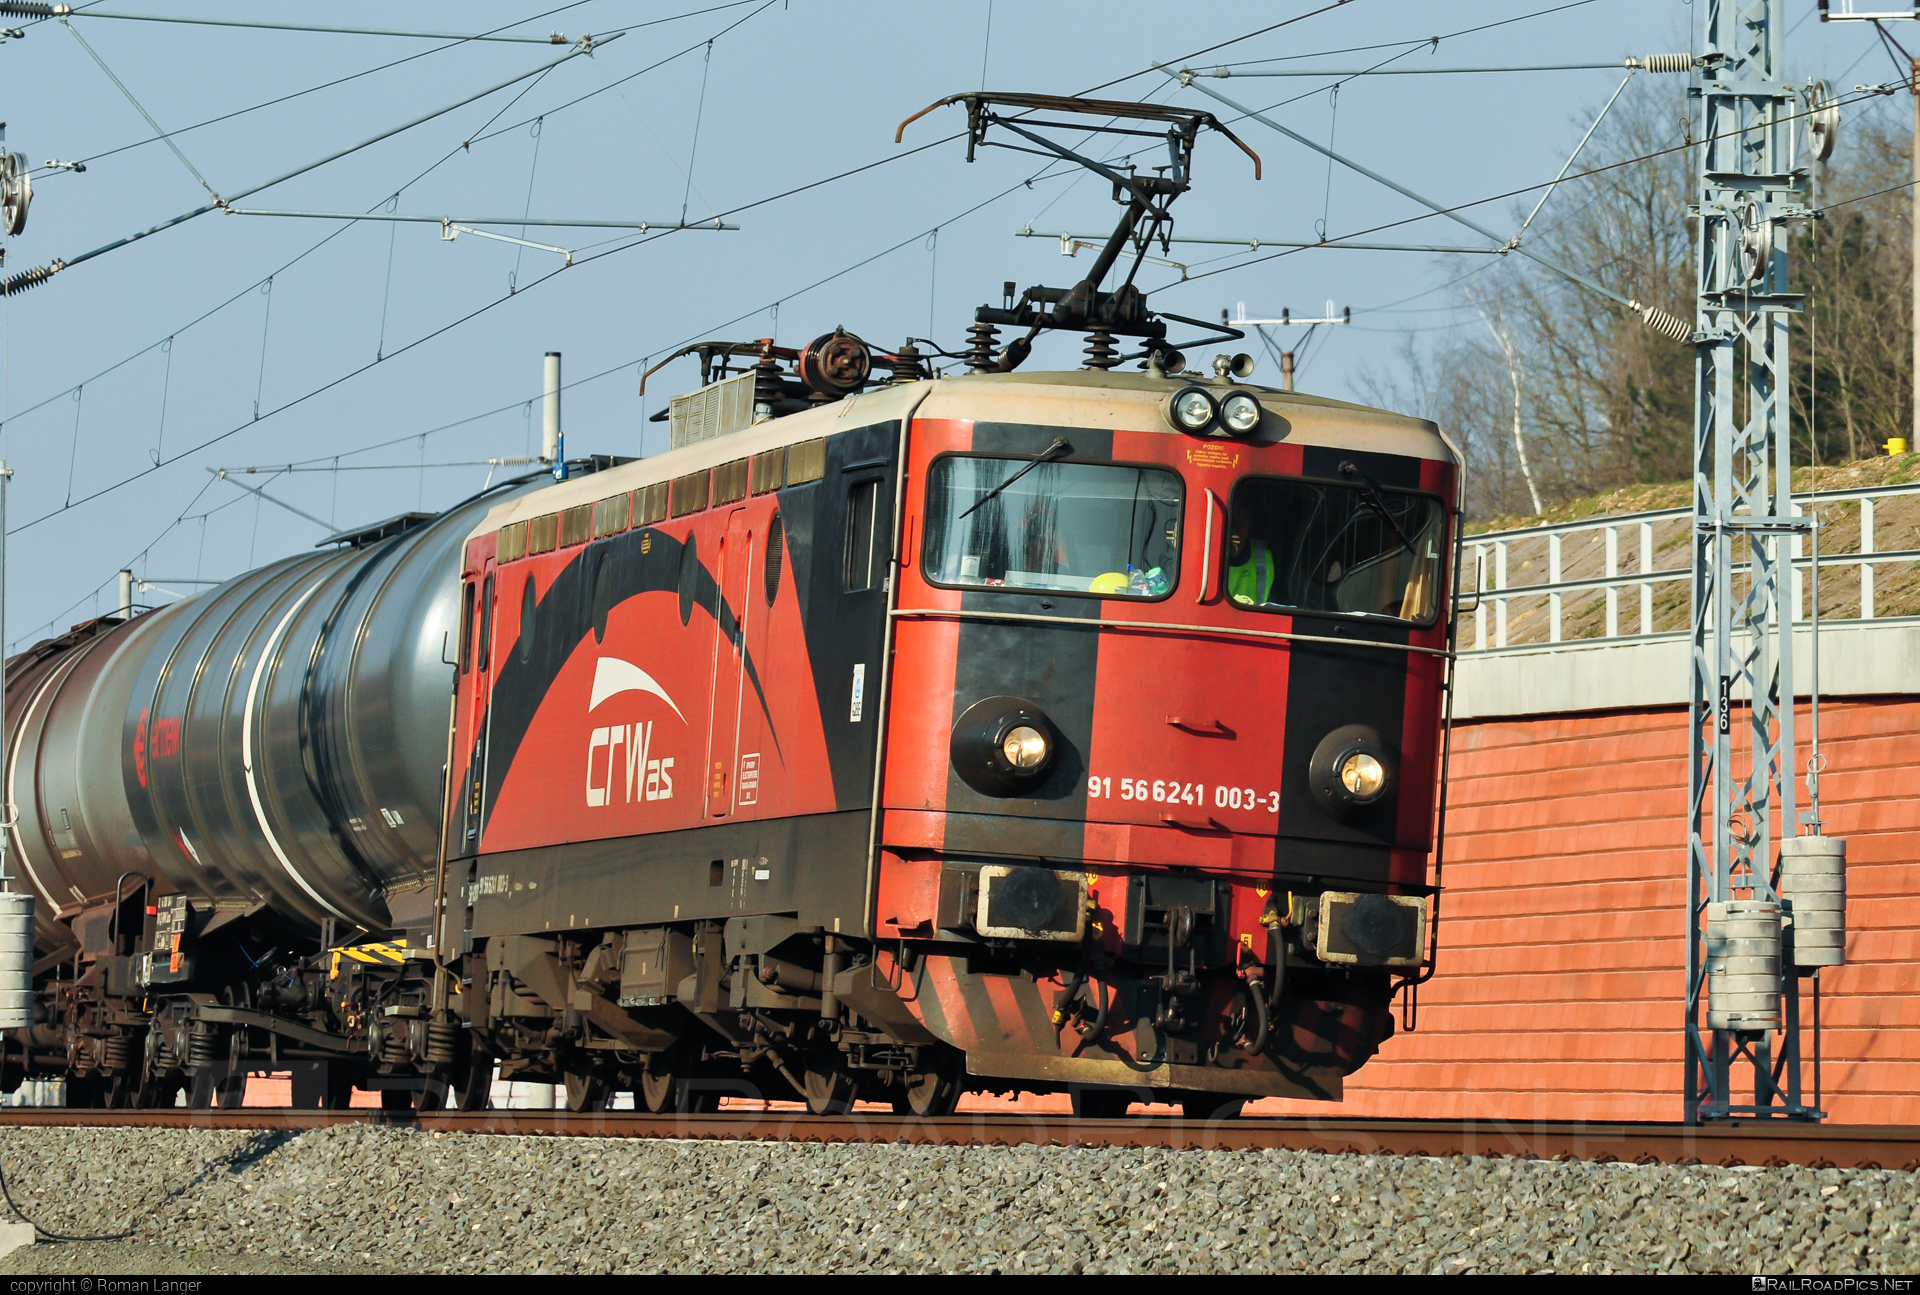 Končar JŽ class 441 - 241 003-3 operated by CENTRAL RAILWAYS s.r.o. #crw #jz441 #koncar #koncar441